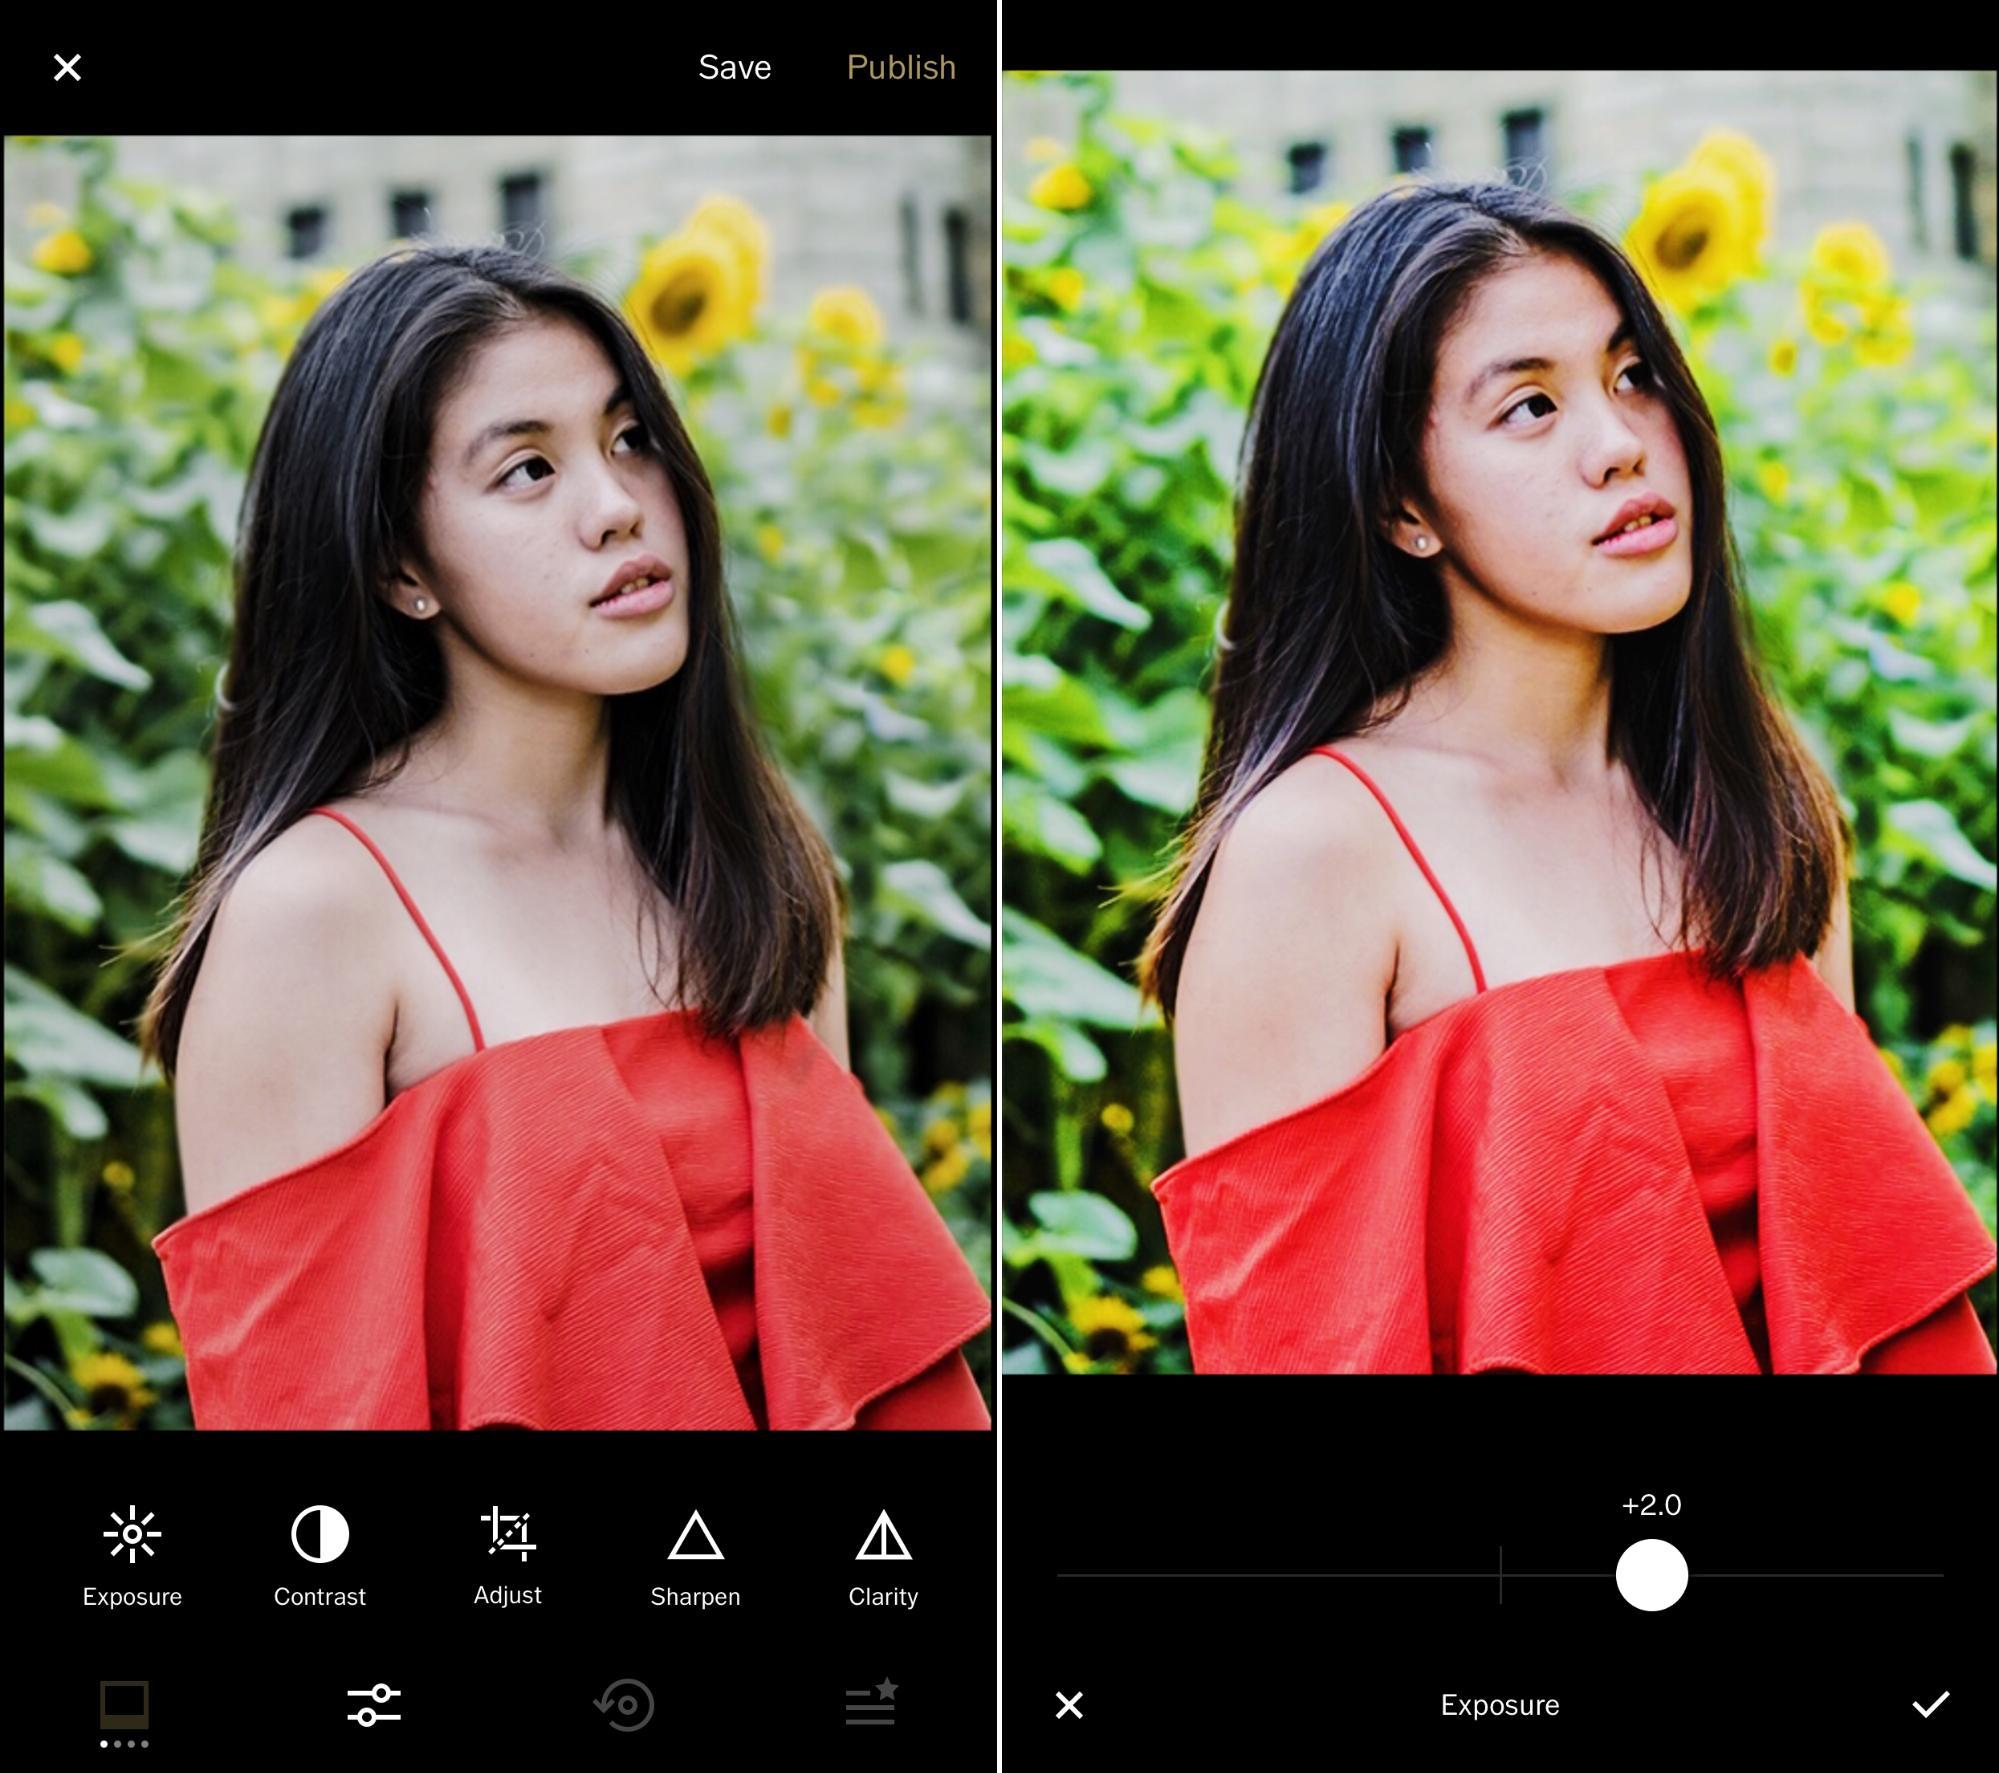 Sunflower Surprise Ootd Using Phone Gbtb Vsco Contrast Brightness